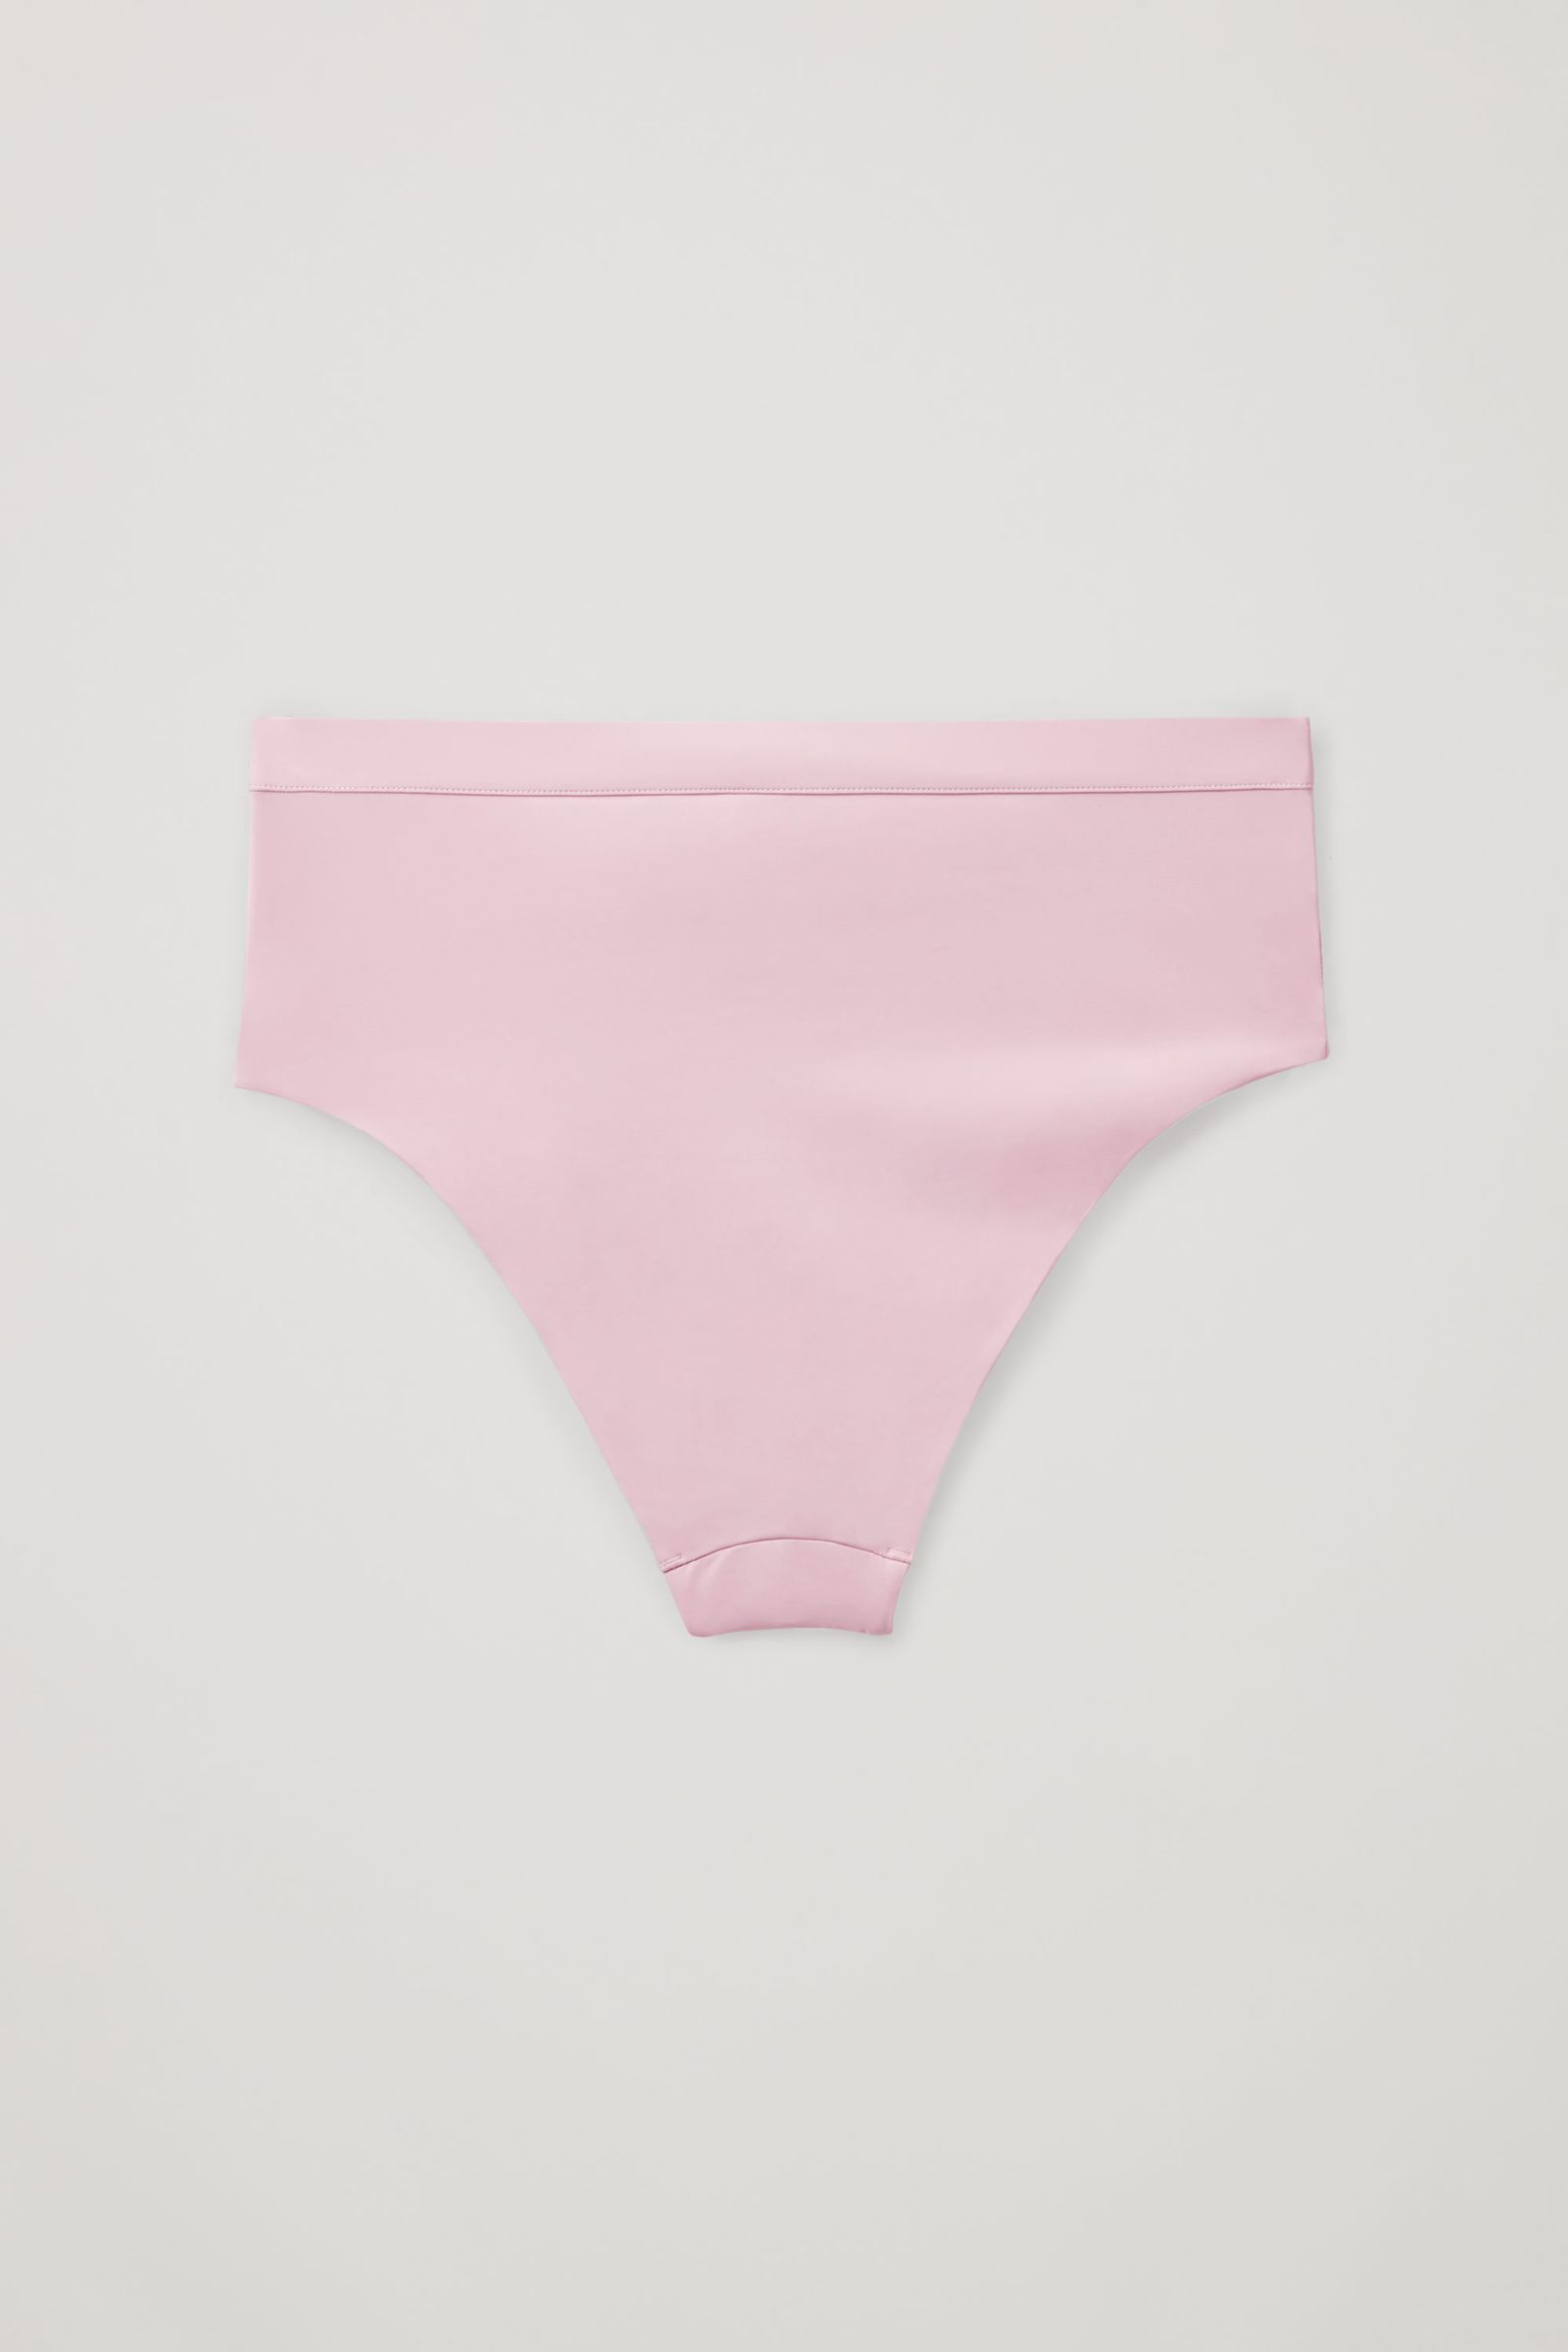 COS 하이 웨이스트 비키니 바텀의 핑크컬러 Product입니다.